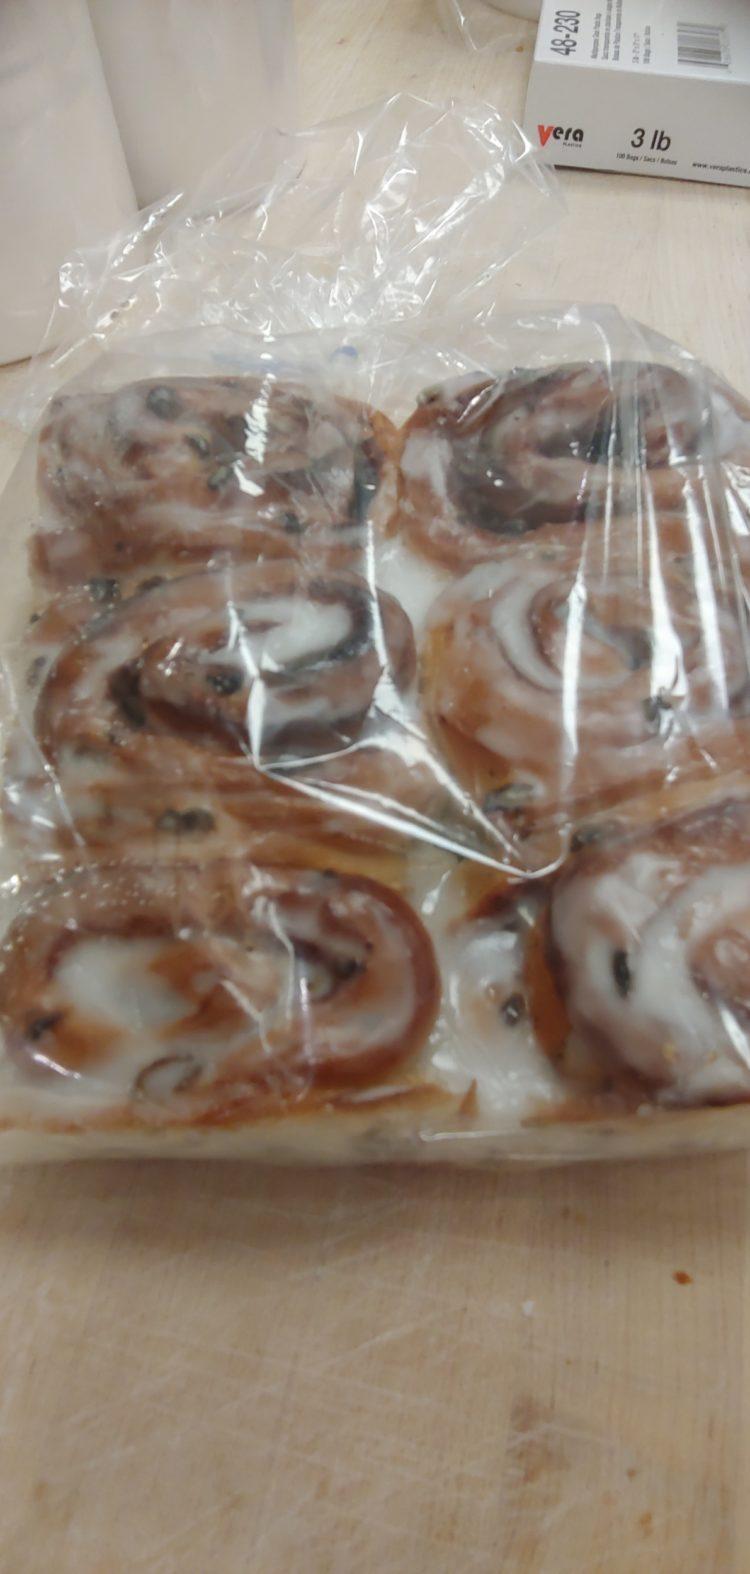 Fresh baked cinnamon buns white rock surrey bakery